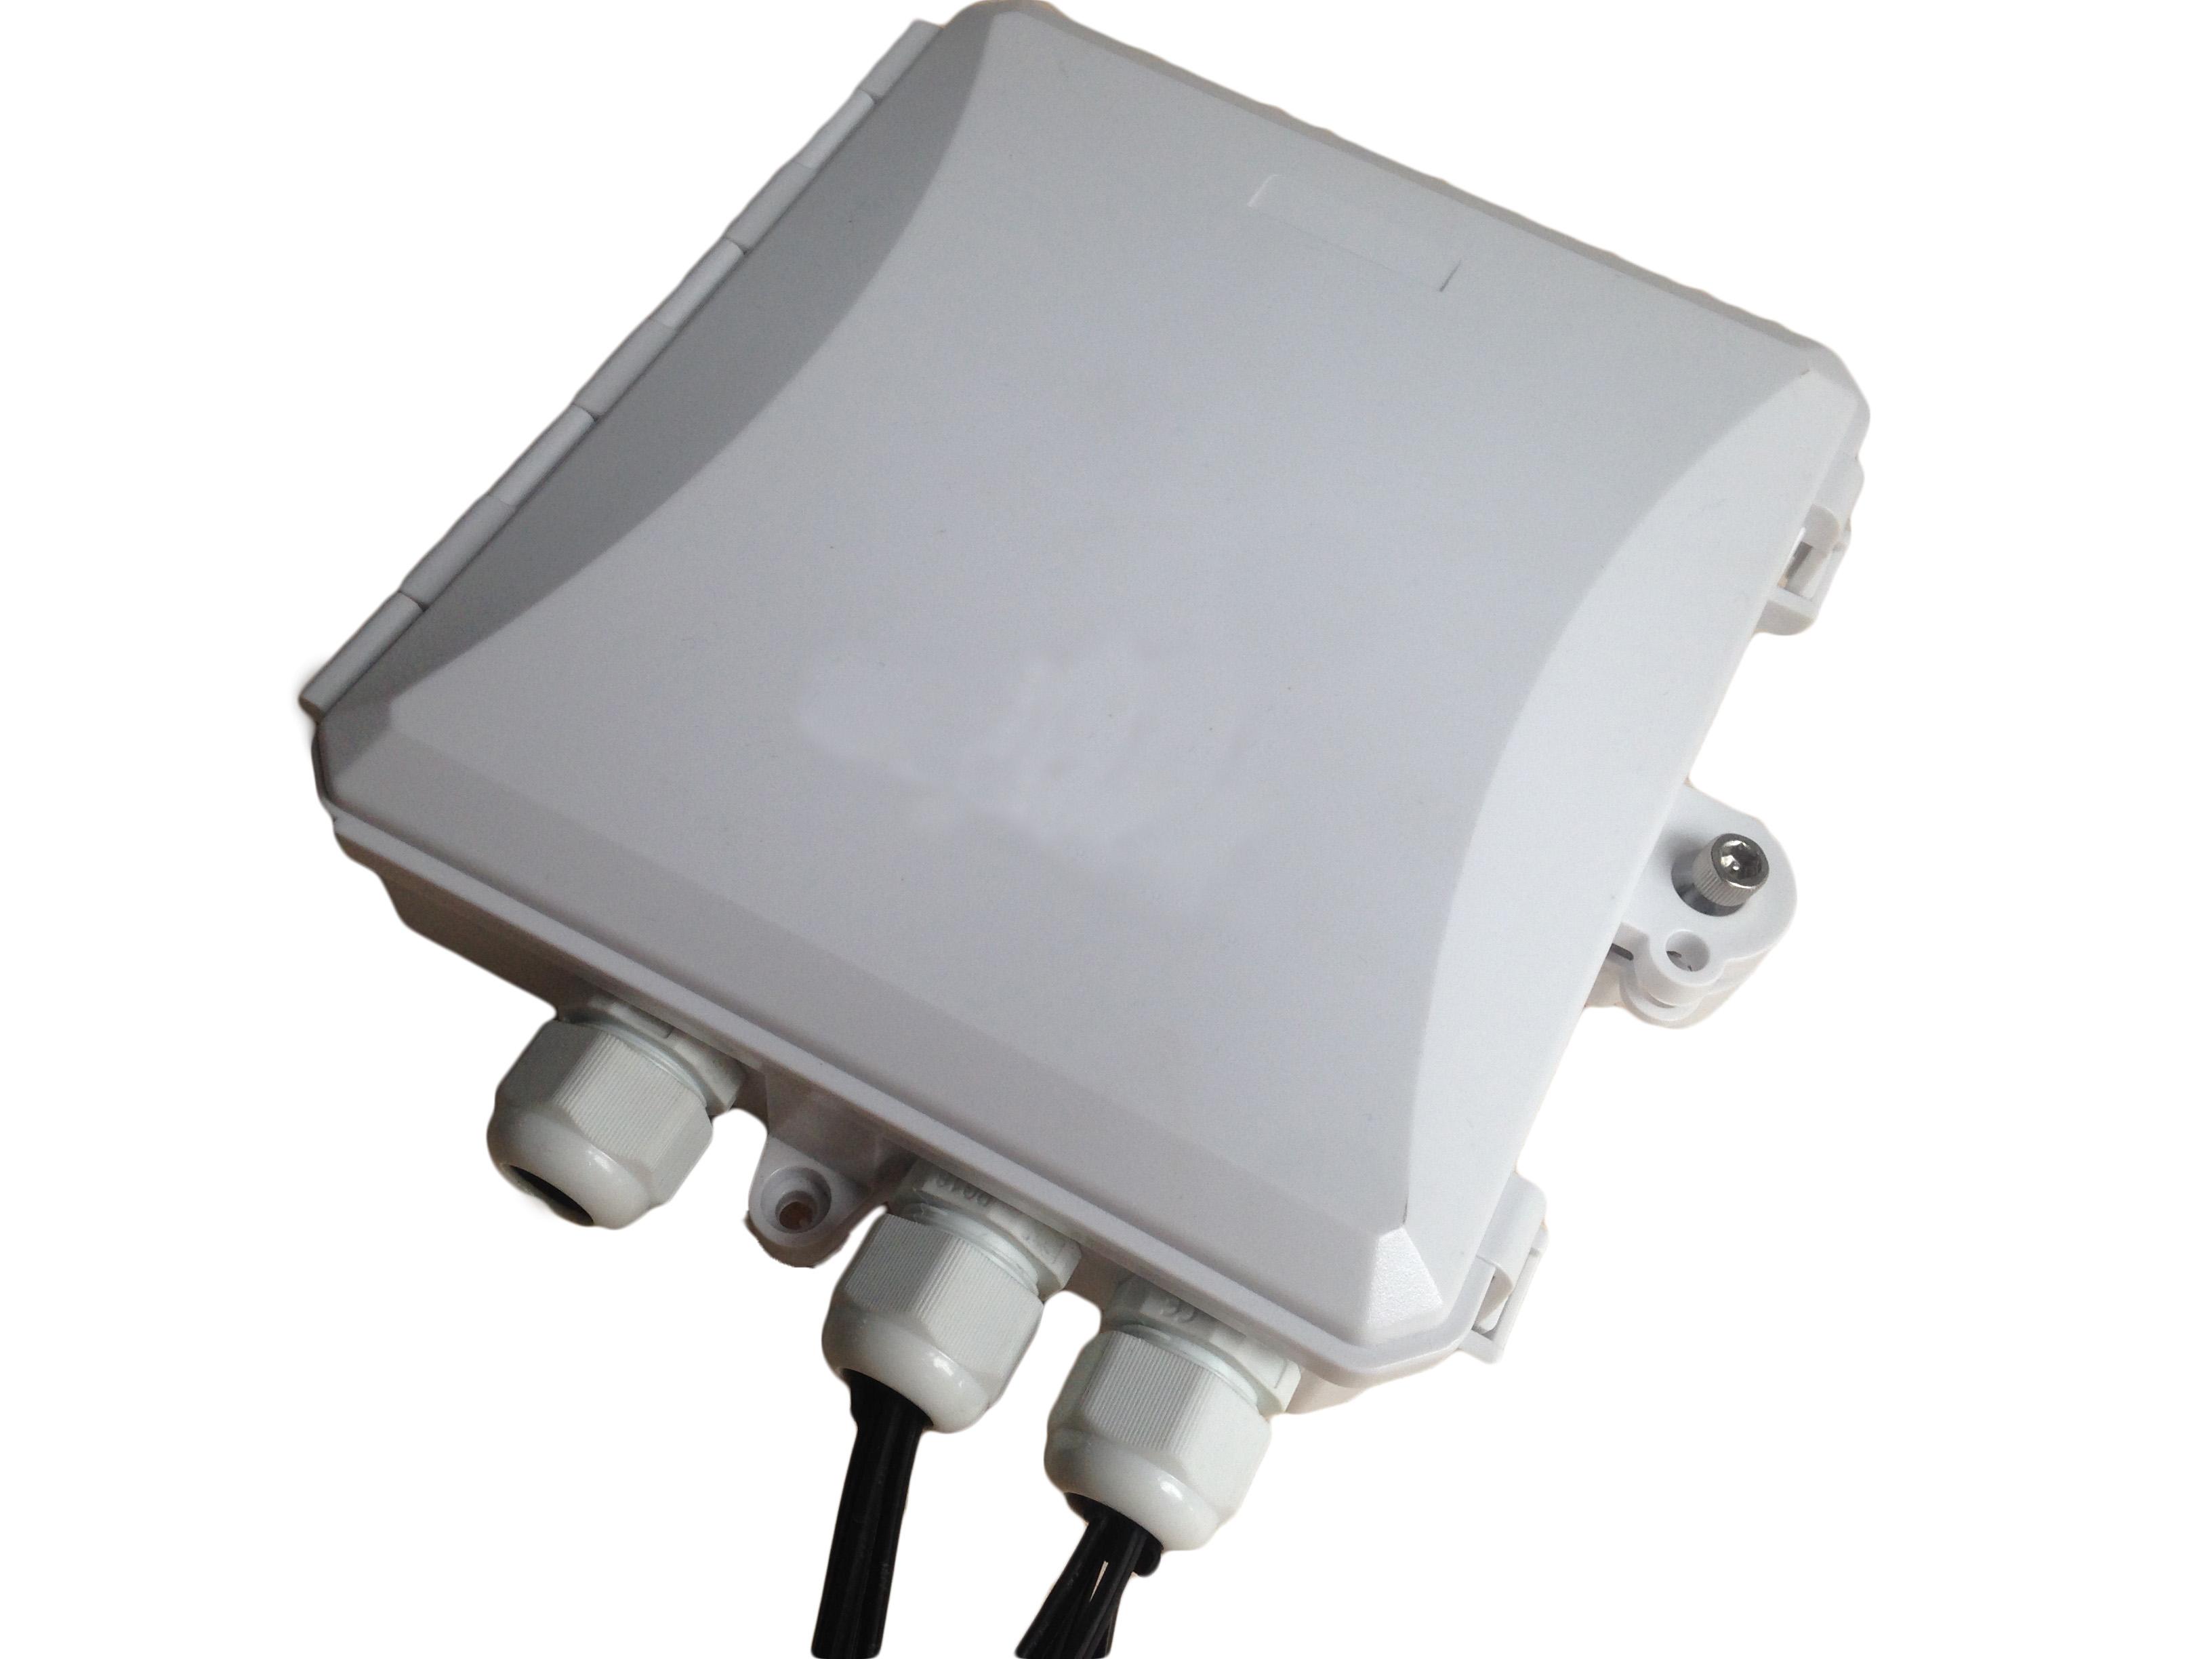 8 cores fiber terminal box, fiber distribution box